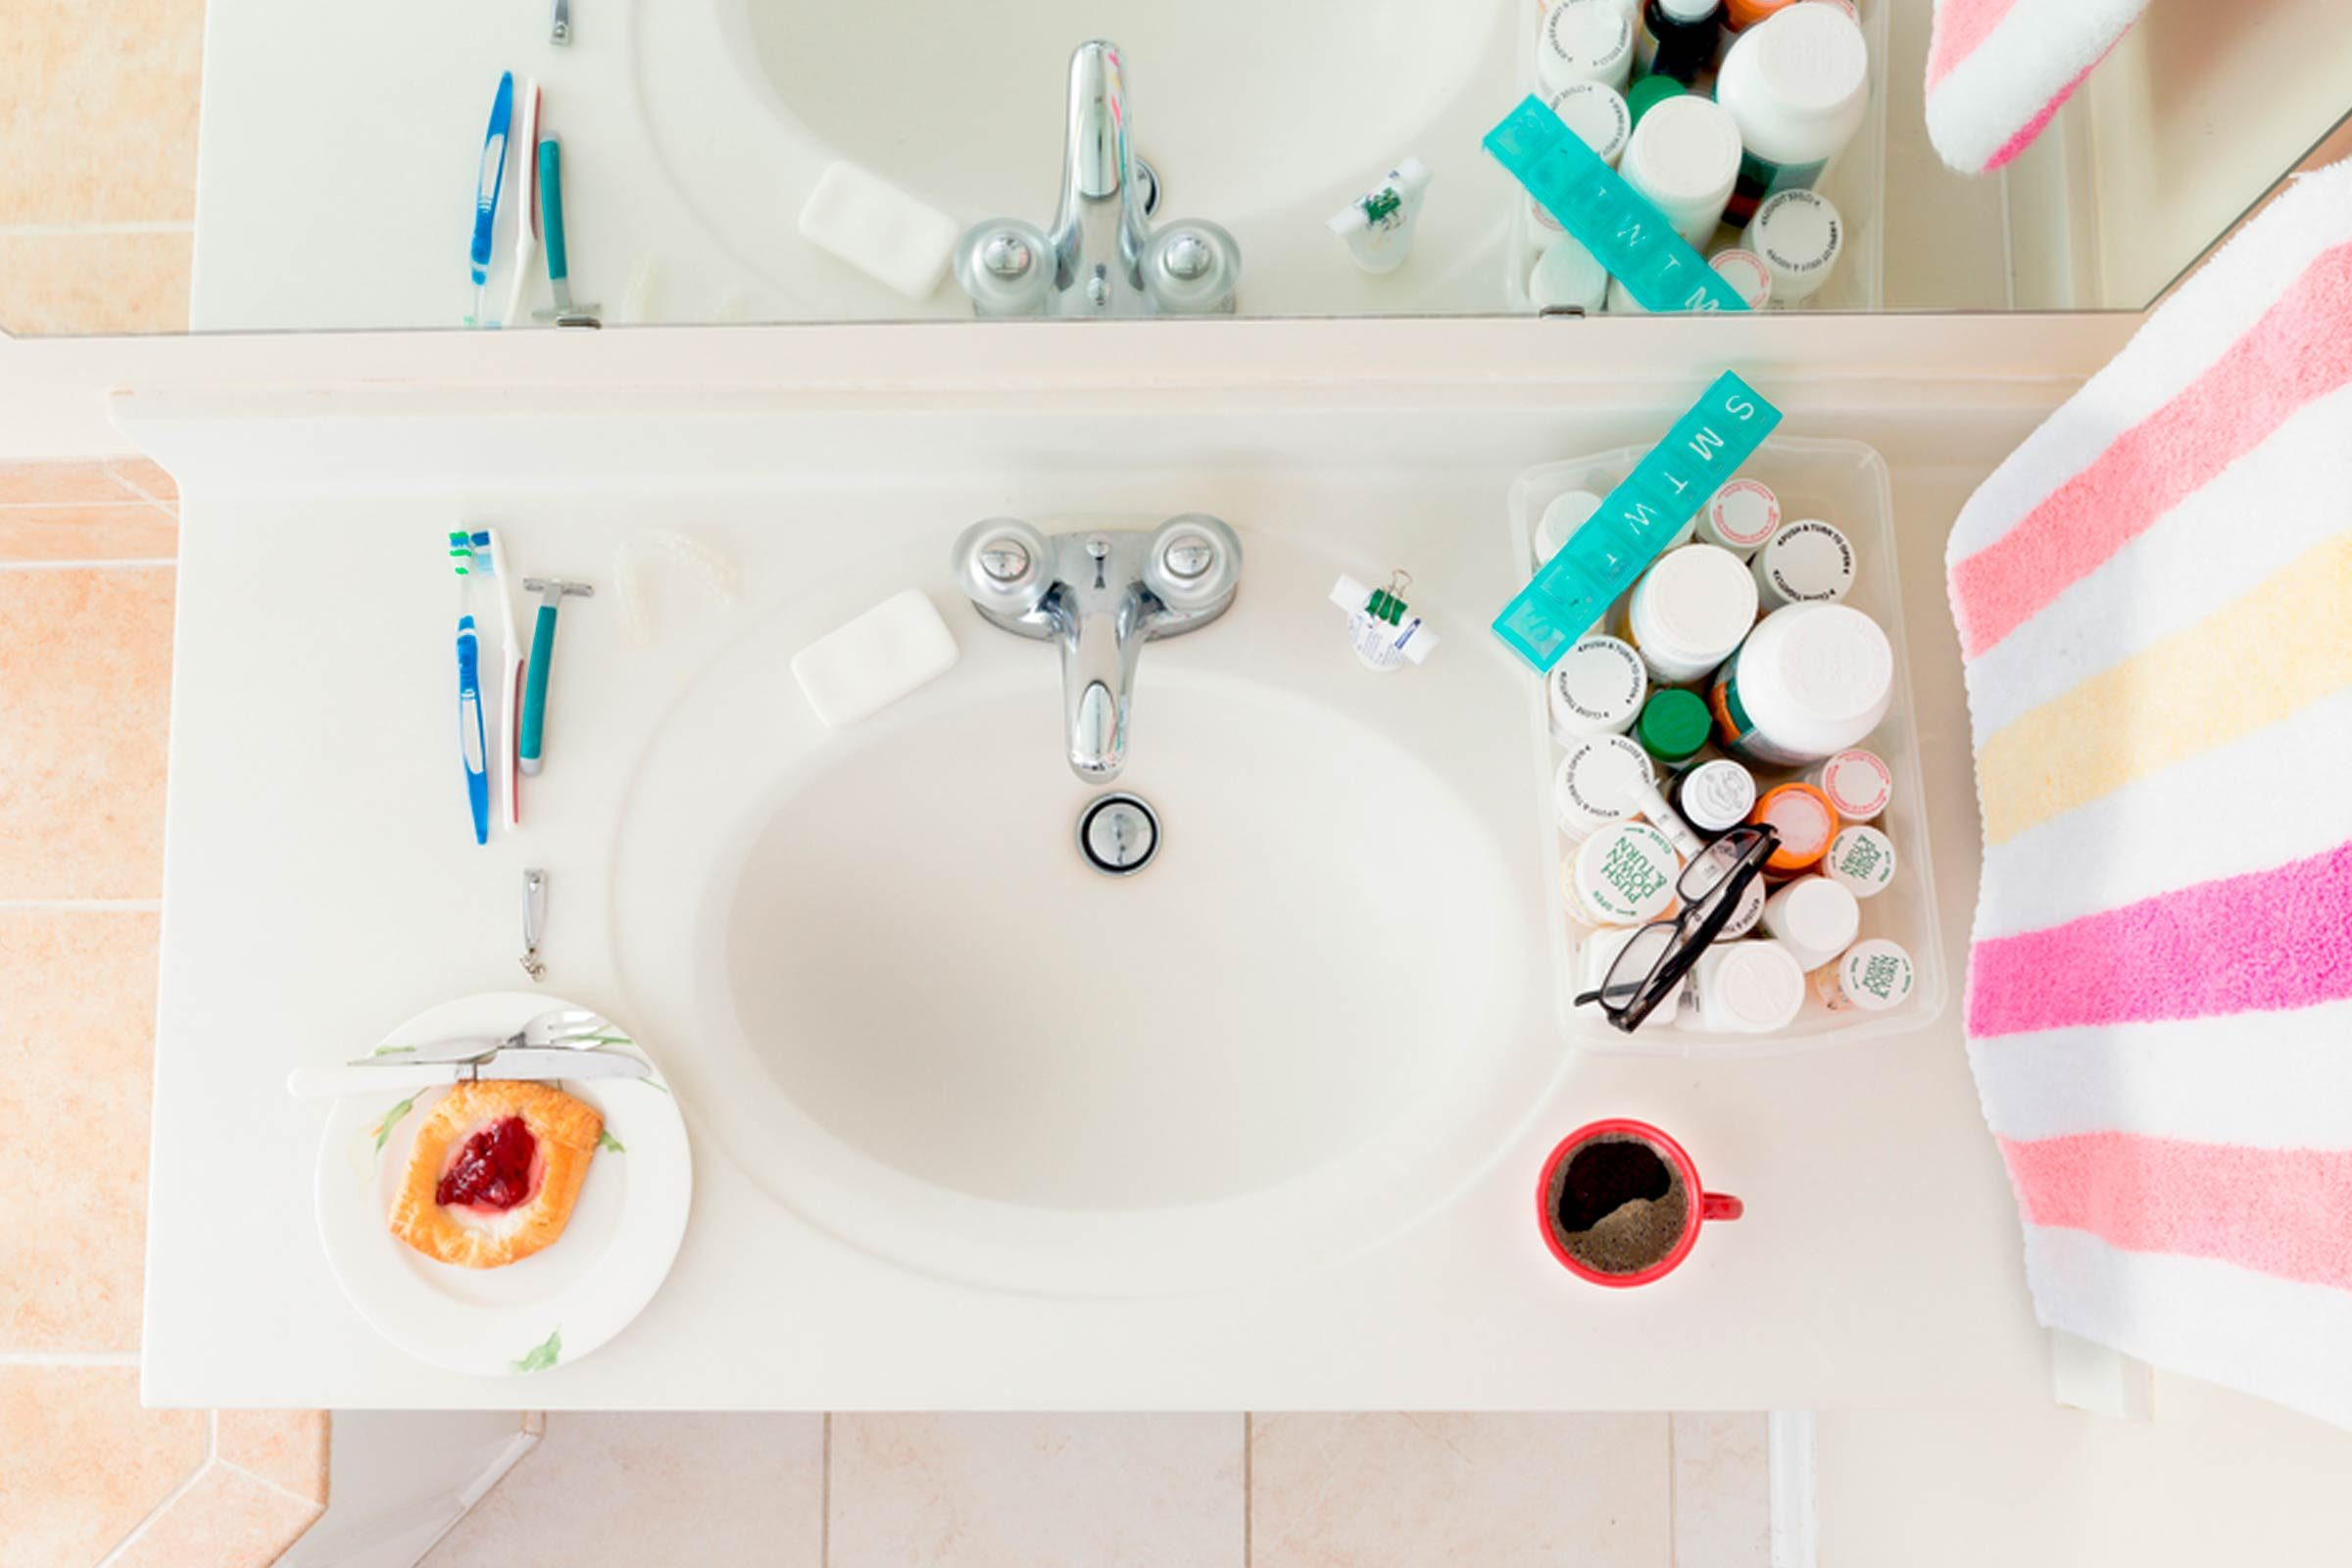 bathroom counter top overhead image